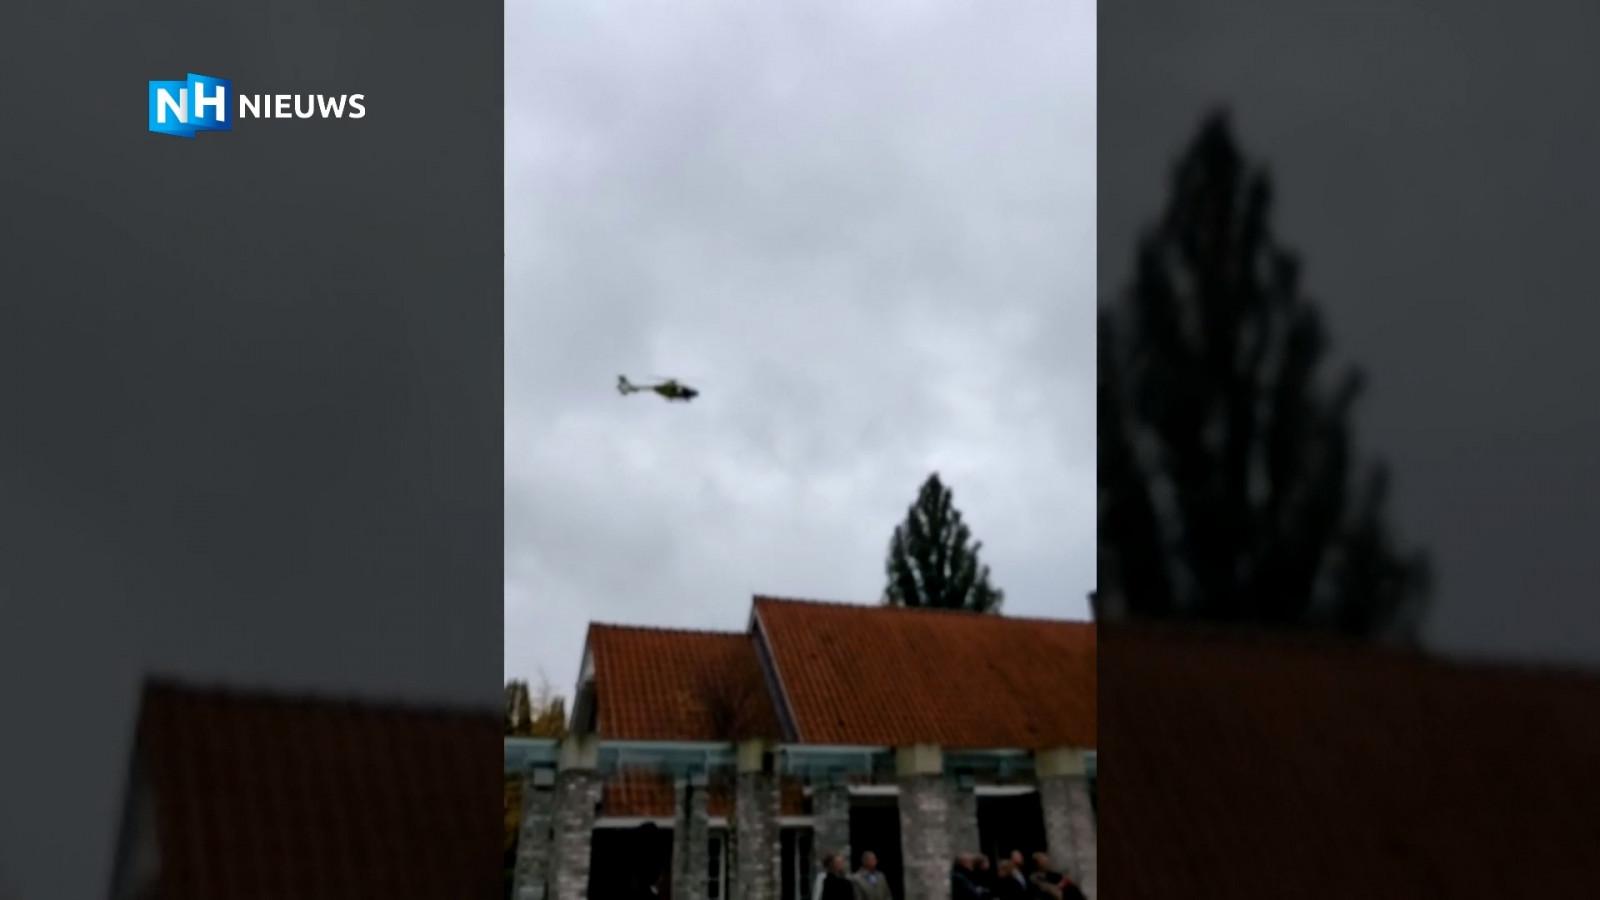 Traumahelikopter brengt eerbetoon aan oud-medewerker tijdens uitvaart in Amsterdam.